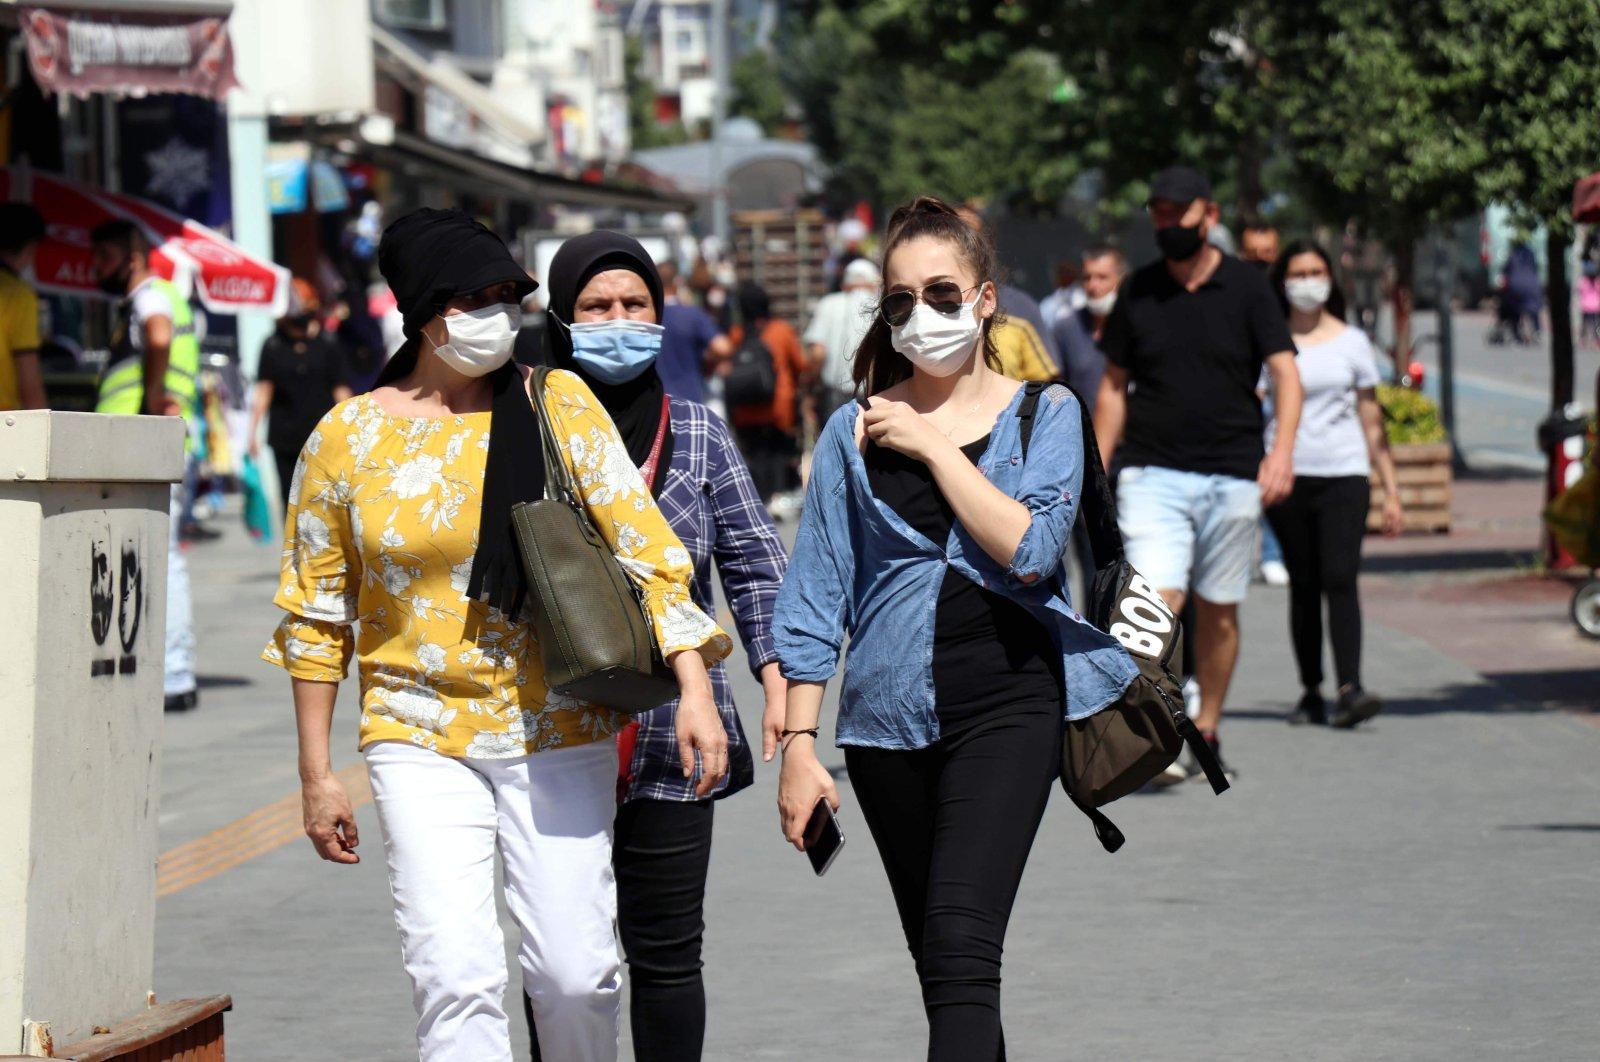 People wearing protective masks against the coronavirus walk on a street in Bolu, northern Turkey, Aug. 20, 2020. (DHA Photo)